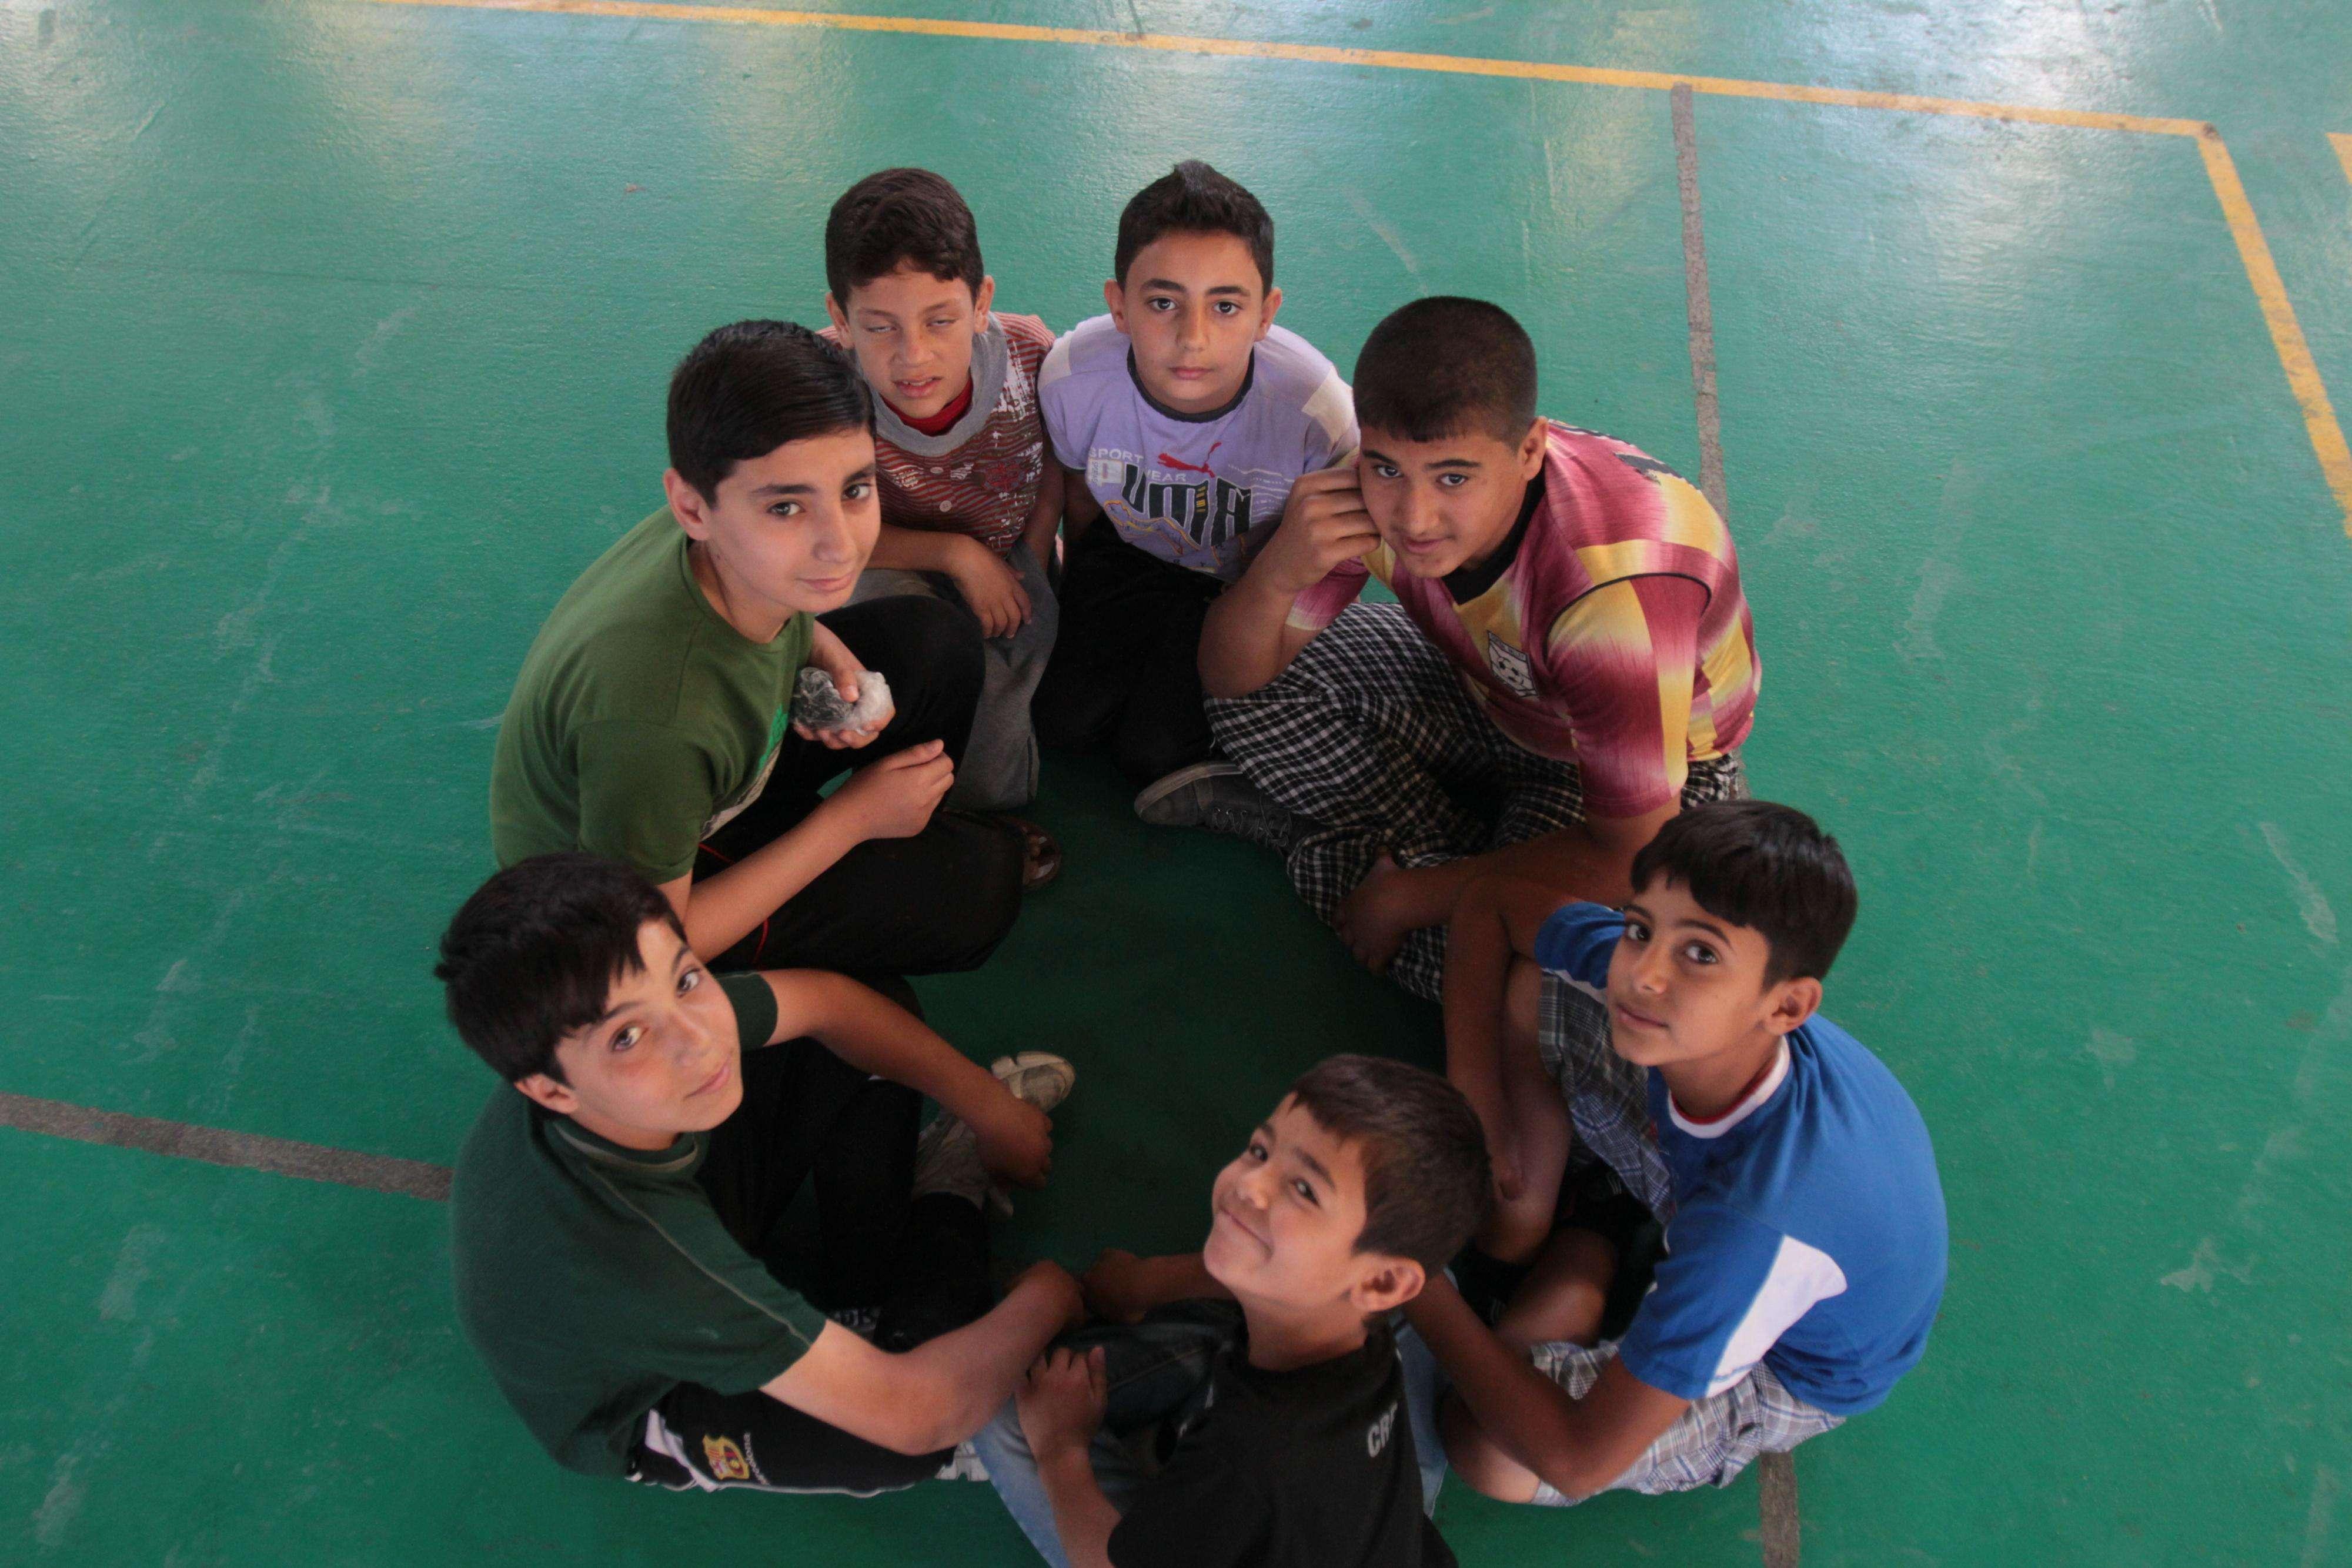 Nader Daoud / Oxfam